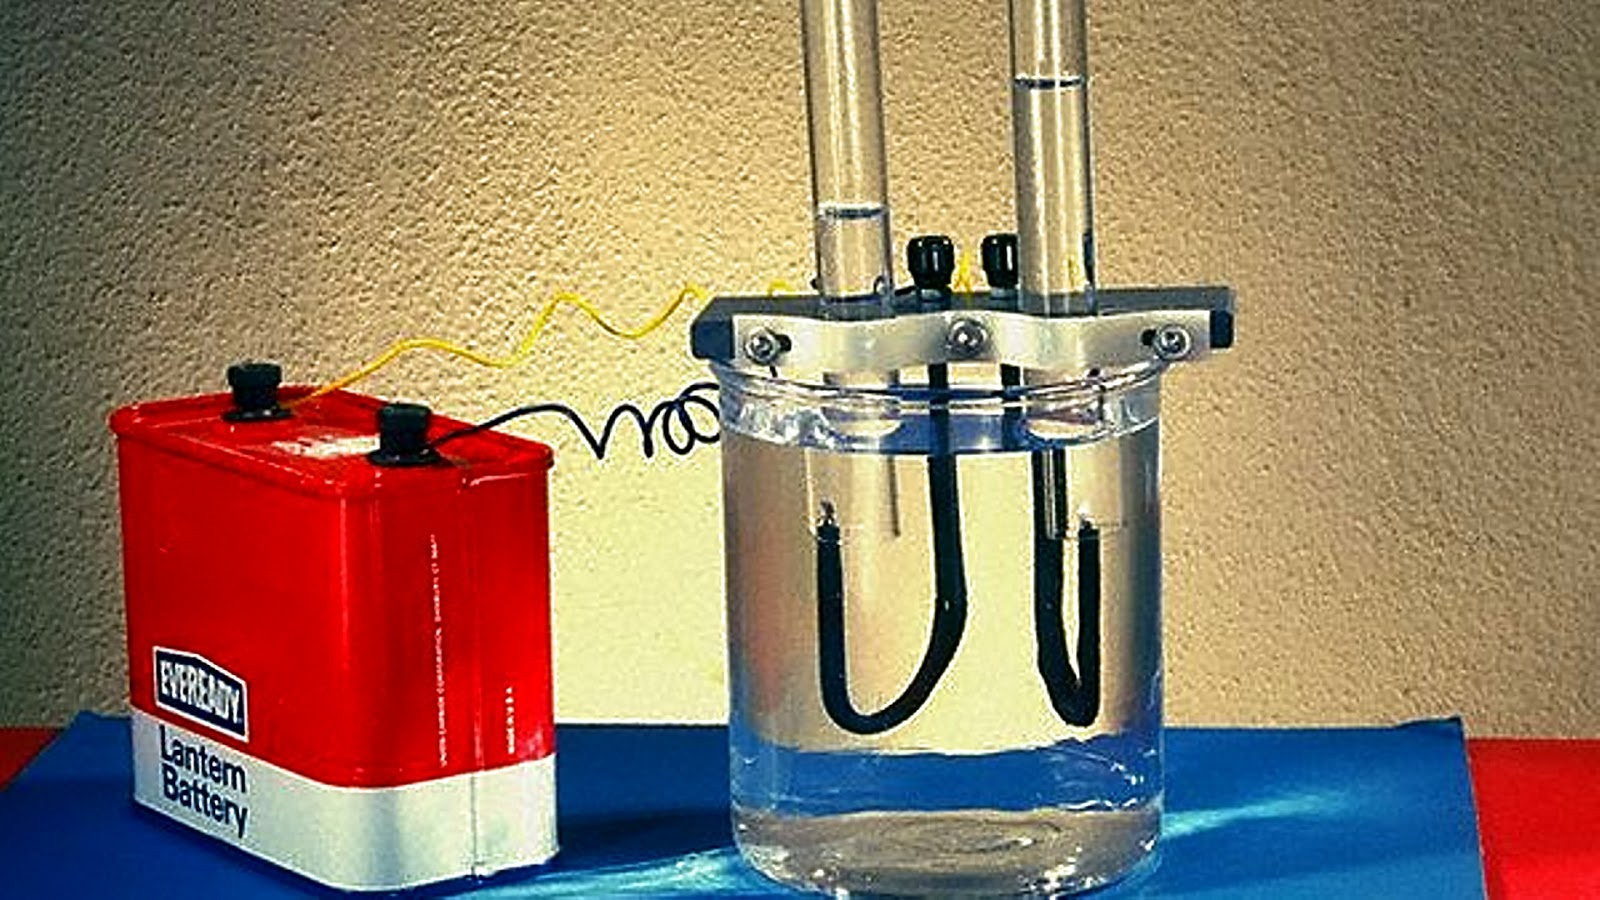 Производства водорода в домашних условиях